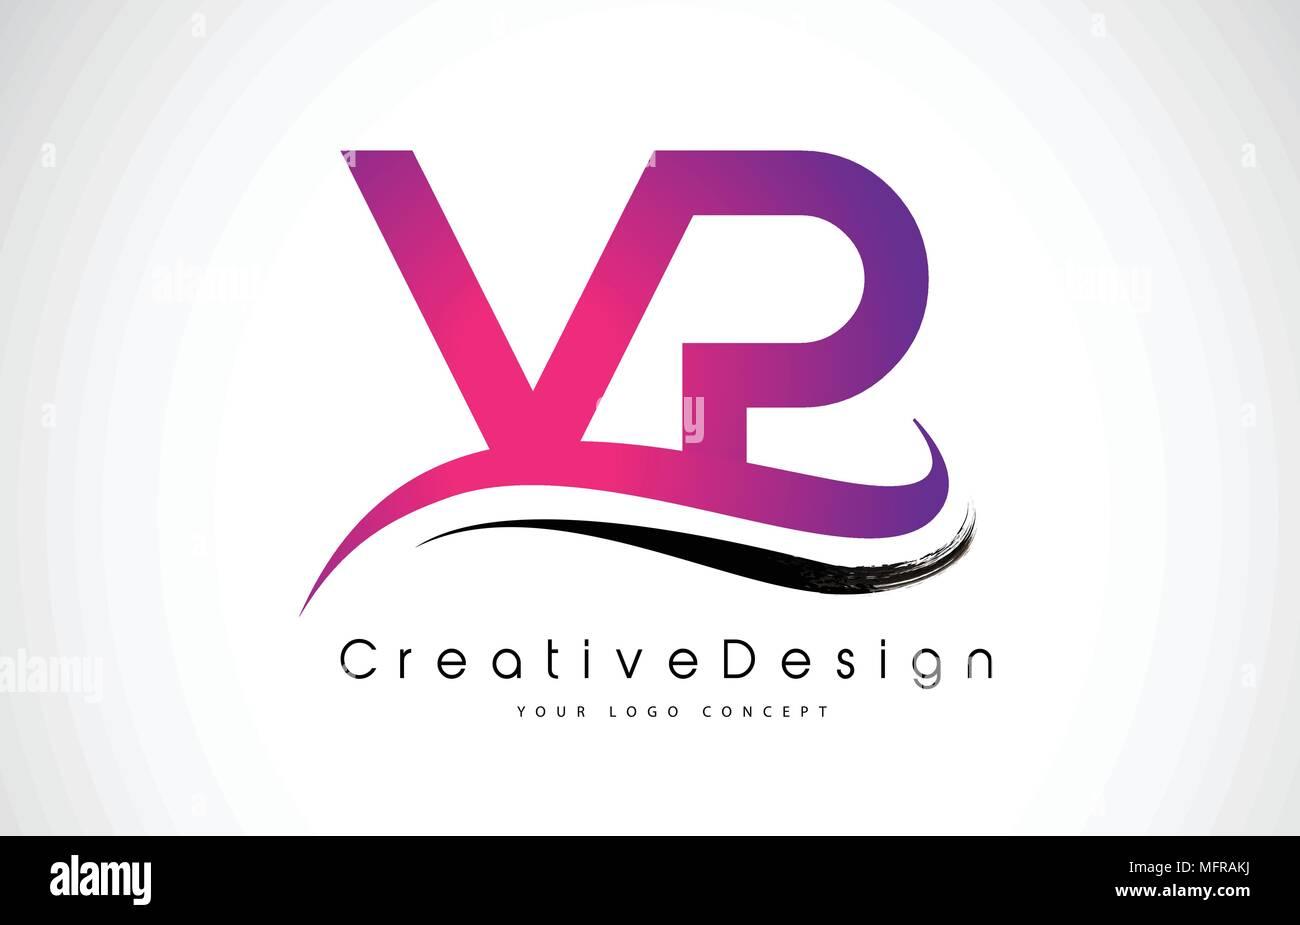 VP V P Letter Logo Design in Black Colors. Creative Modern Letters ...